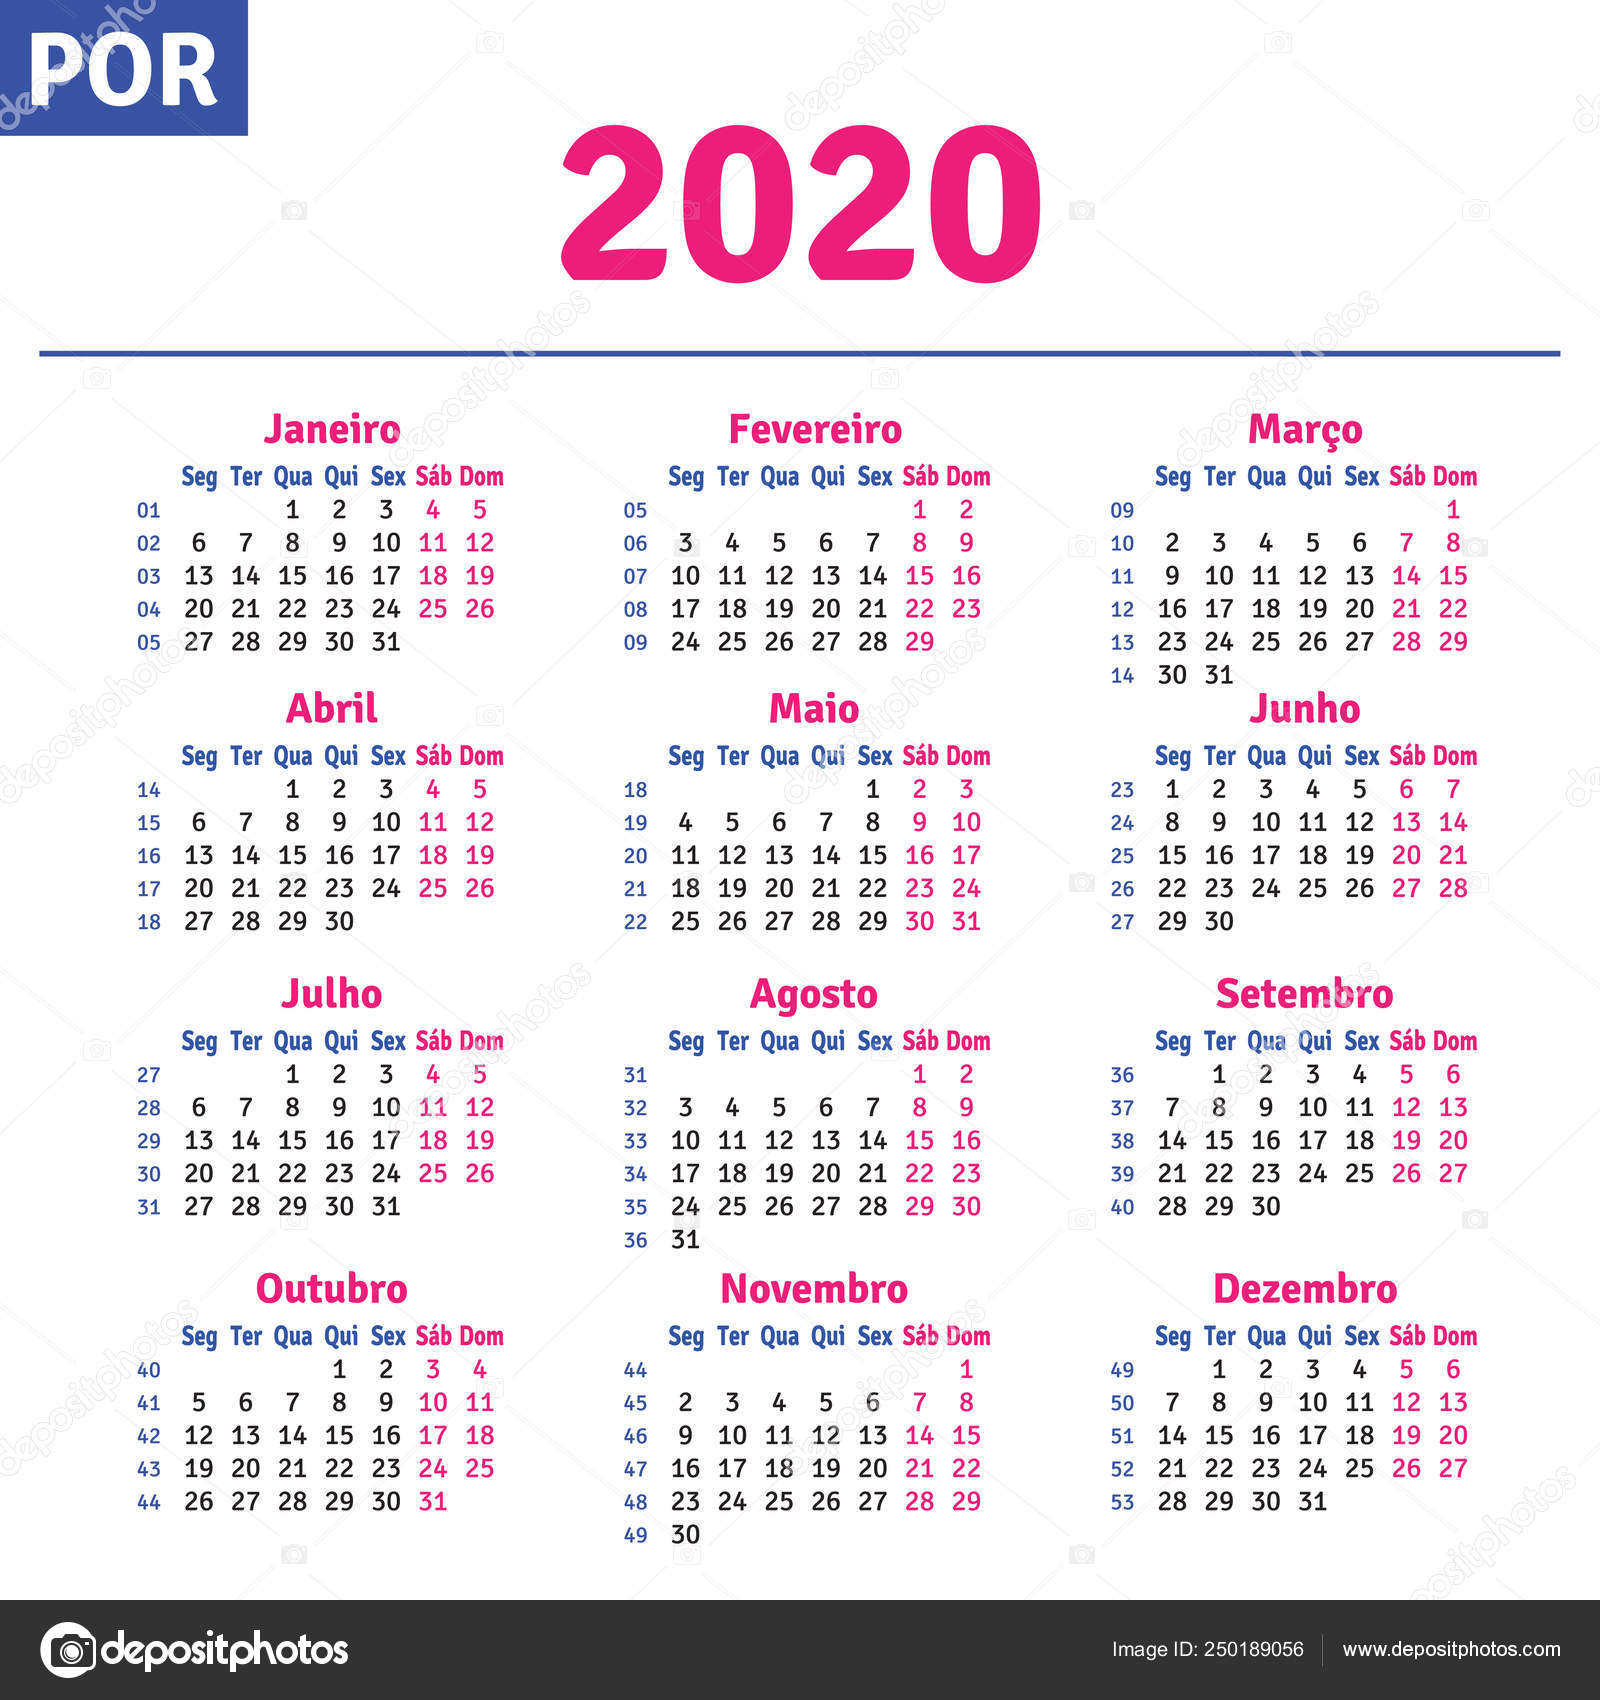 Calendario 2020 Brasileiro Com Feriados.Portugues Brasileiro Calendar 2020 Vetor De Stock